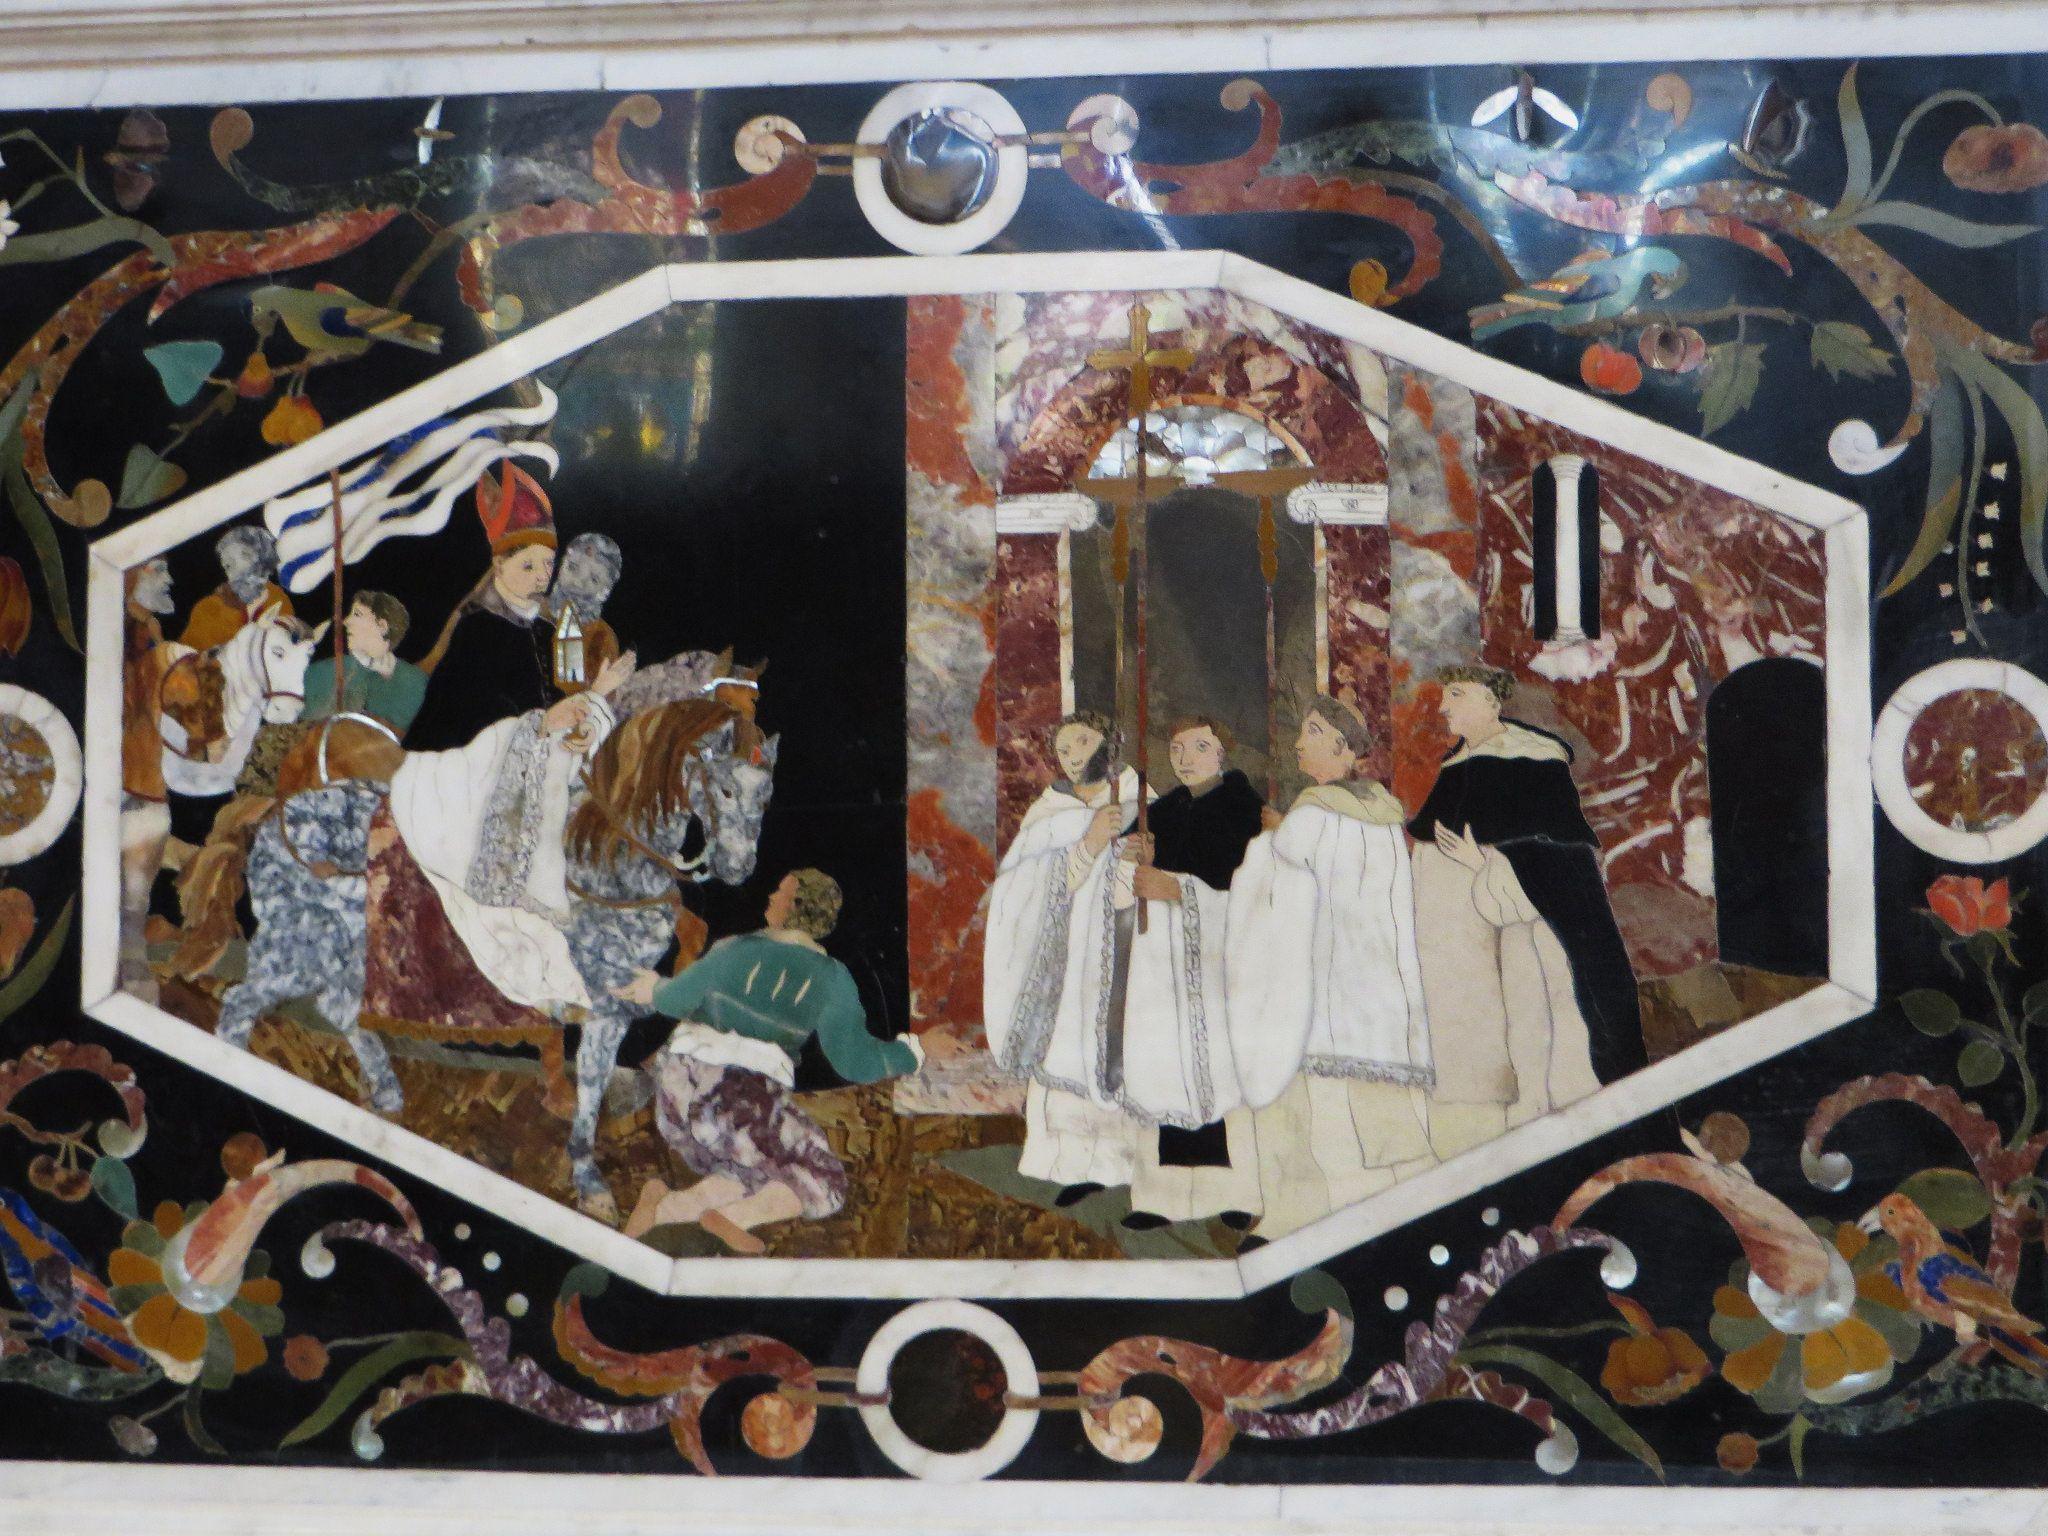 Marqueterie De Pierres Dures Matre-autel 1667-1669 Glise Santa Corona Xiiie Contr